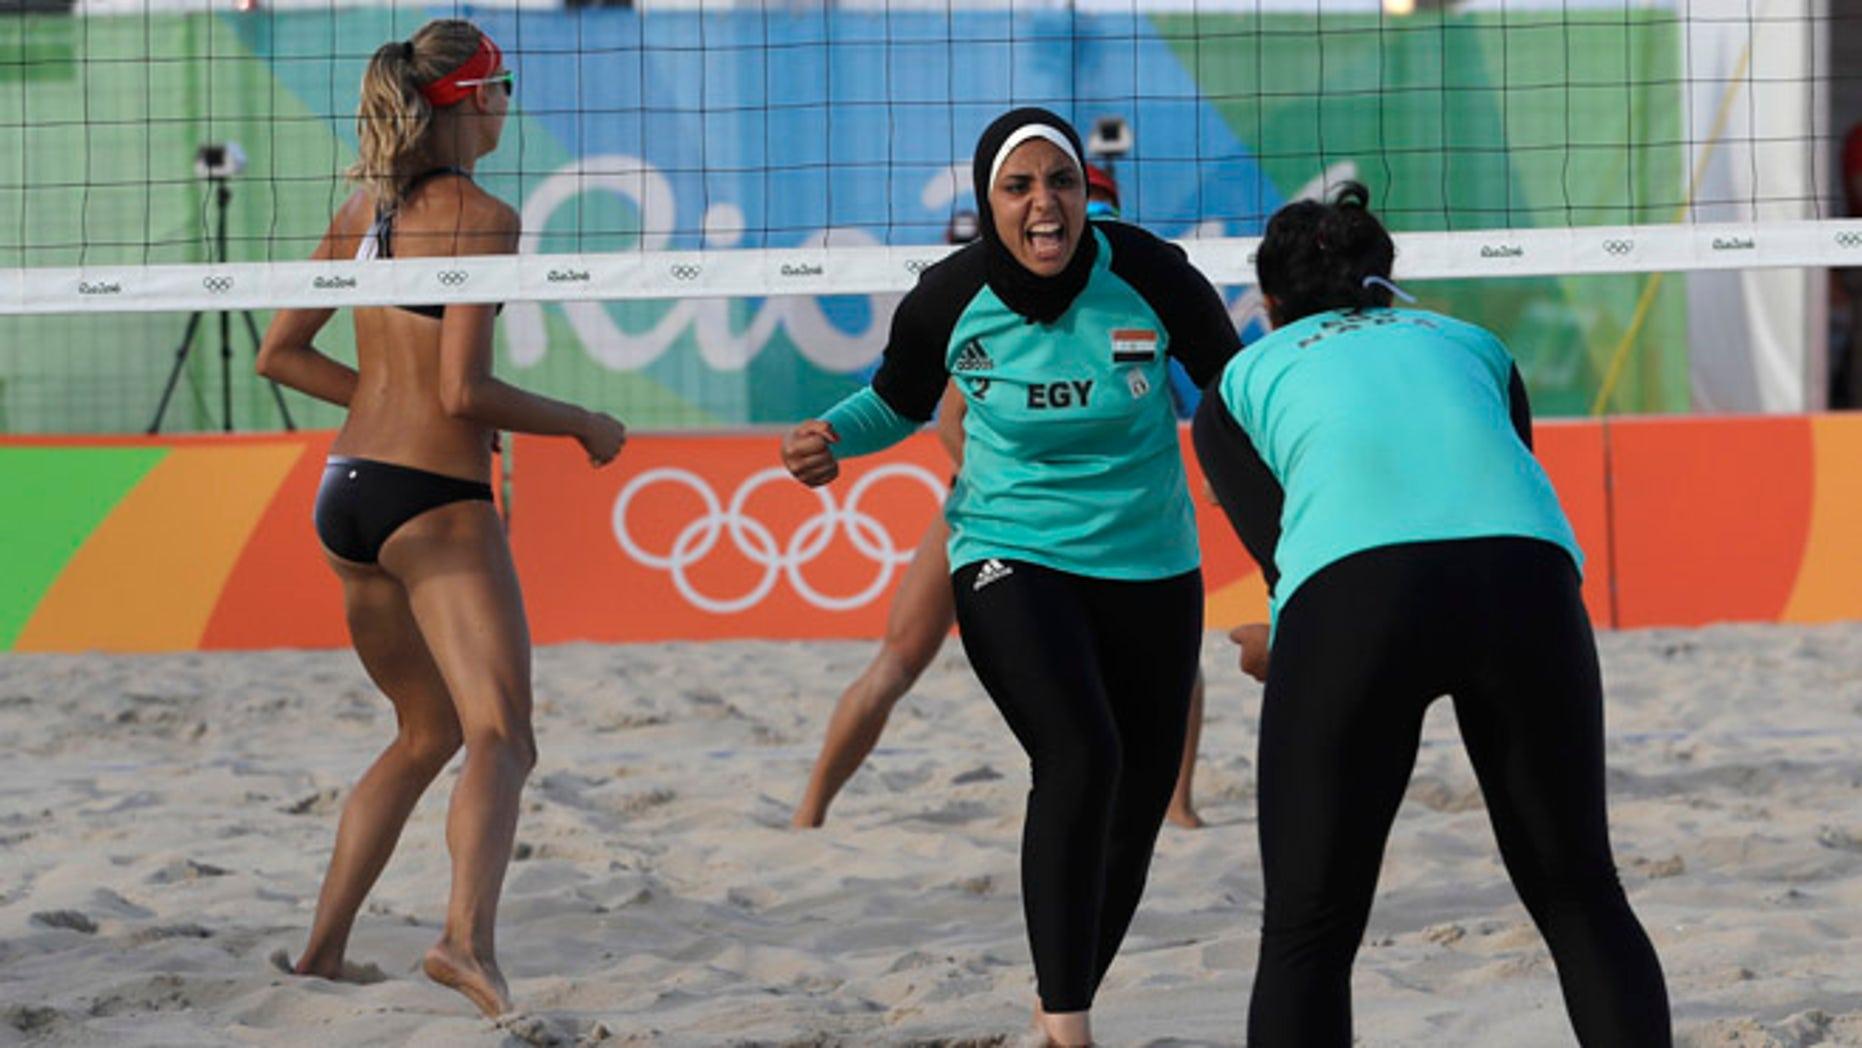 Beach Voley Porn Comic beach volleyball uniform slips